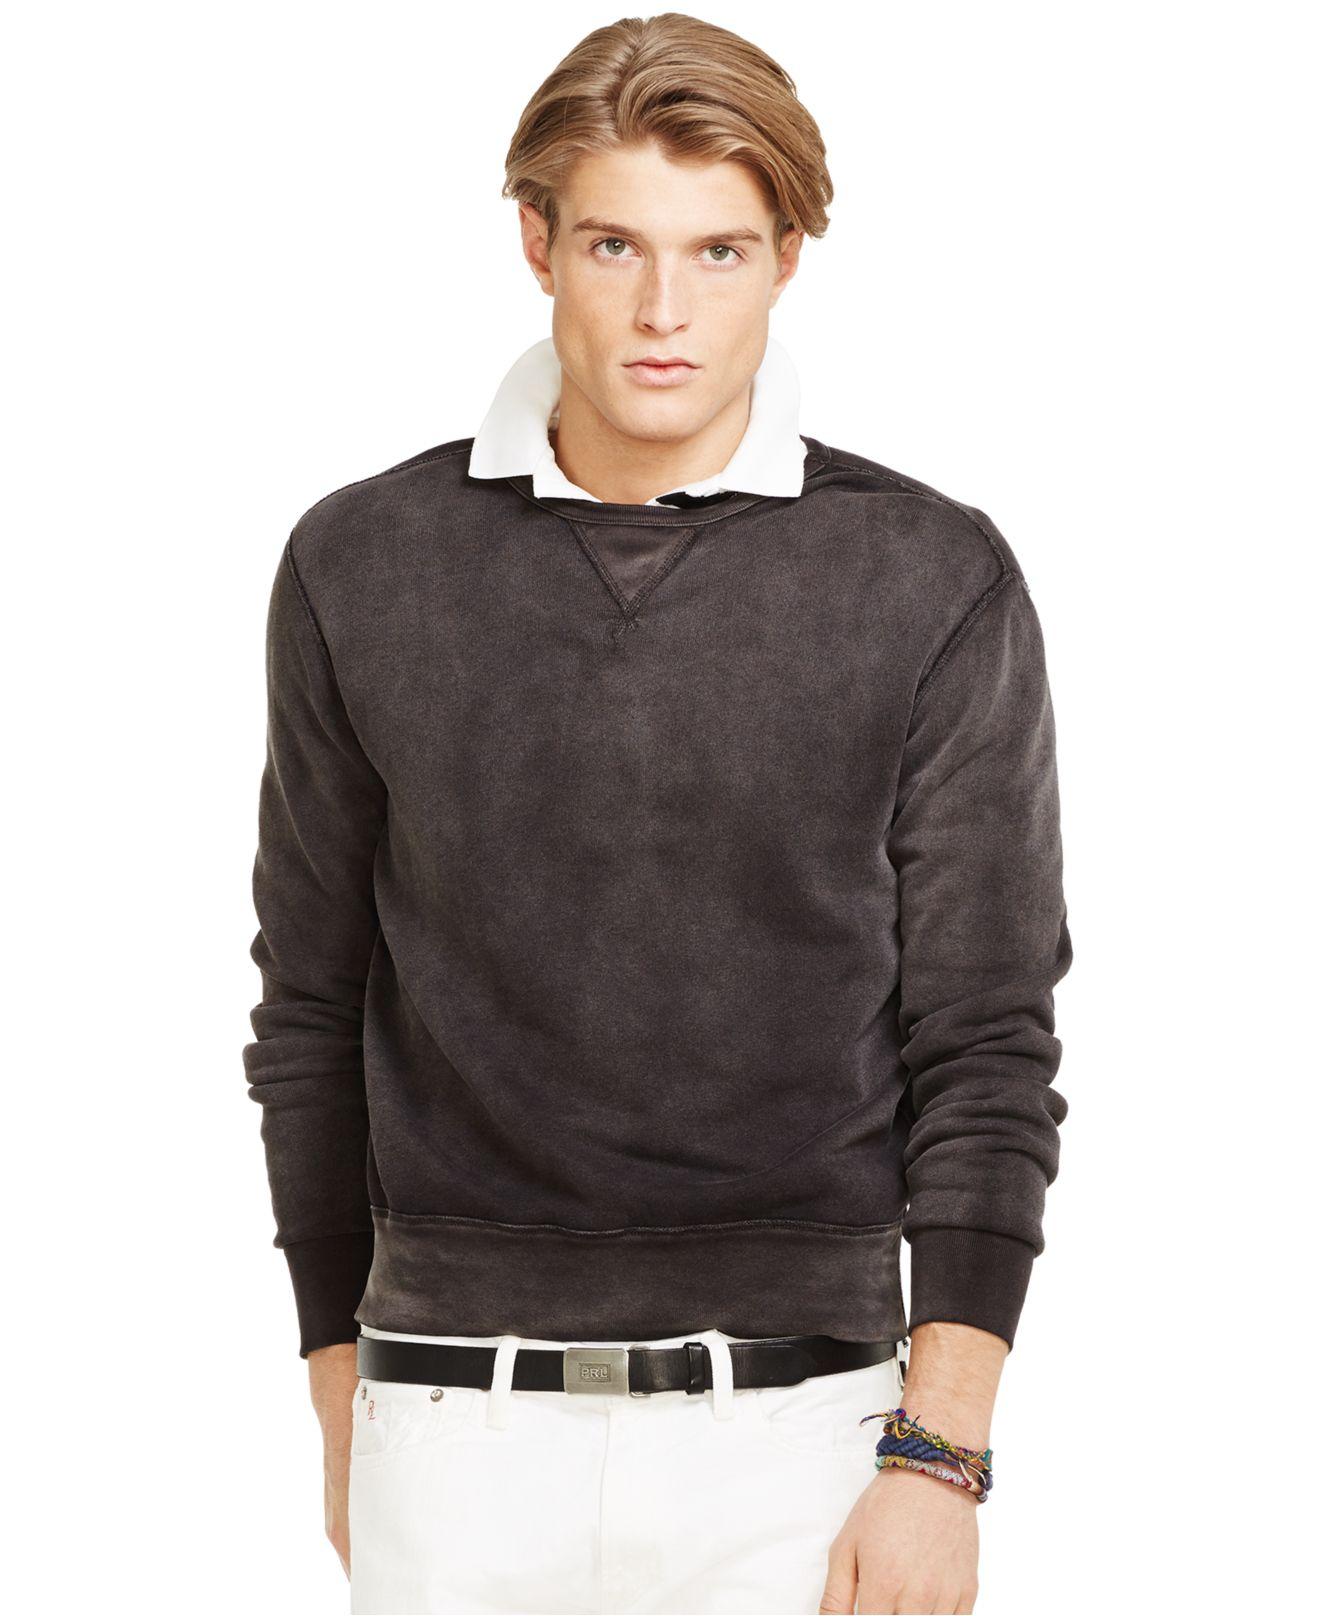 polo ralph lauren fleece crewneck pullover in brown for men polo. Black Bedroom Furniture Sets. Home Design Ideas